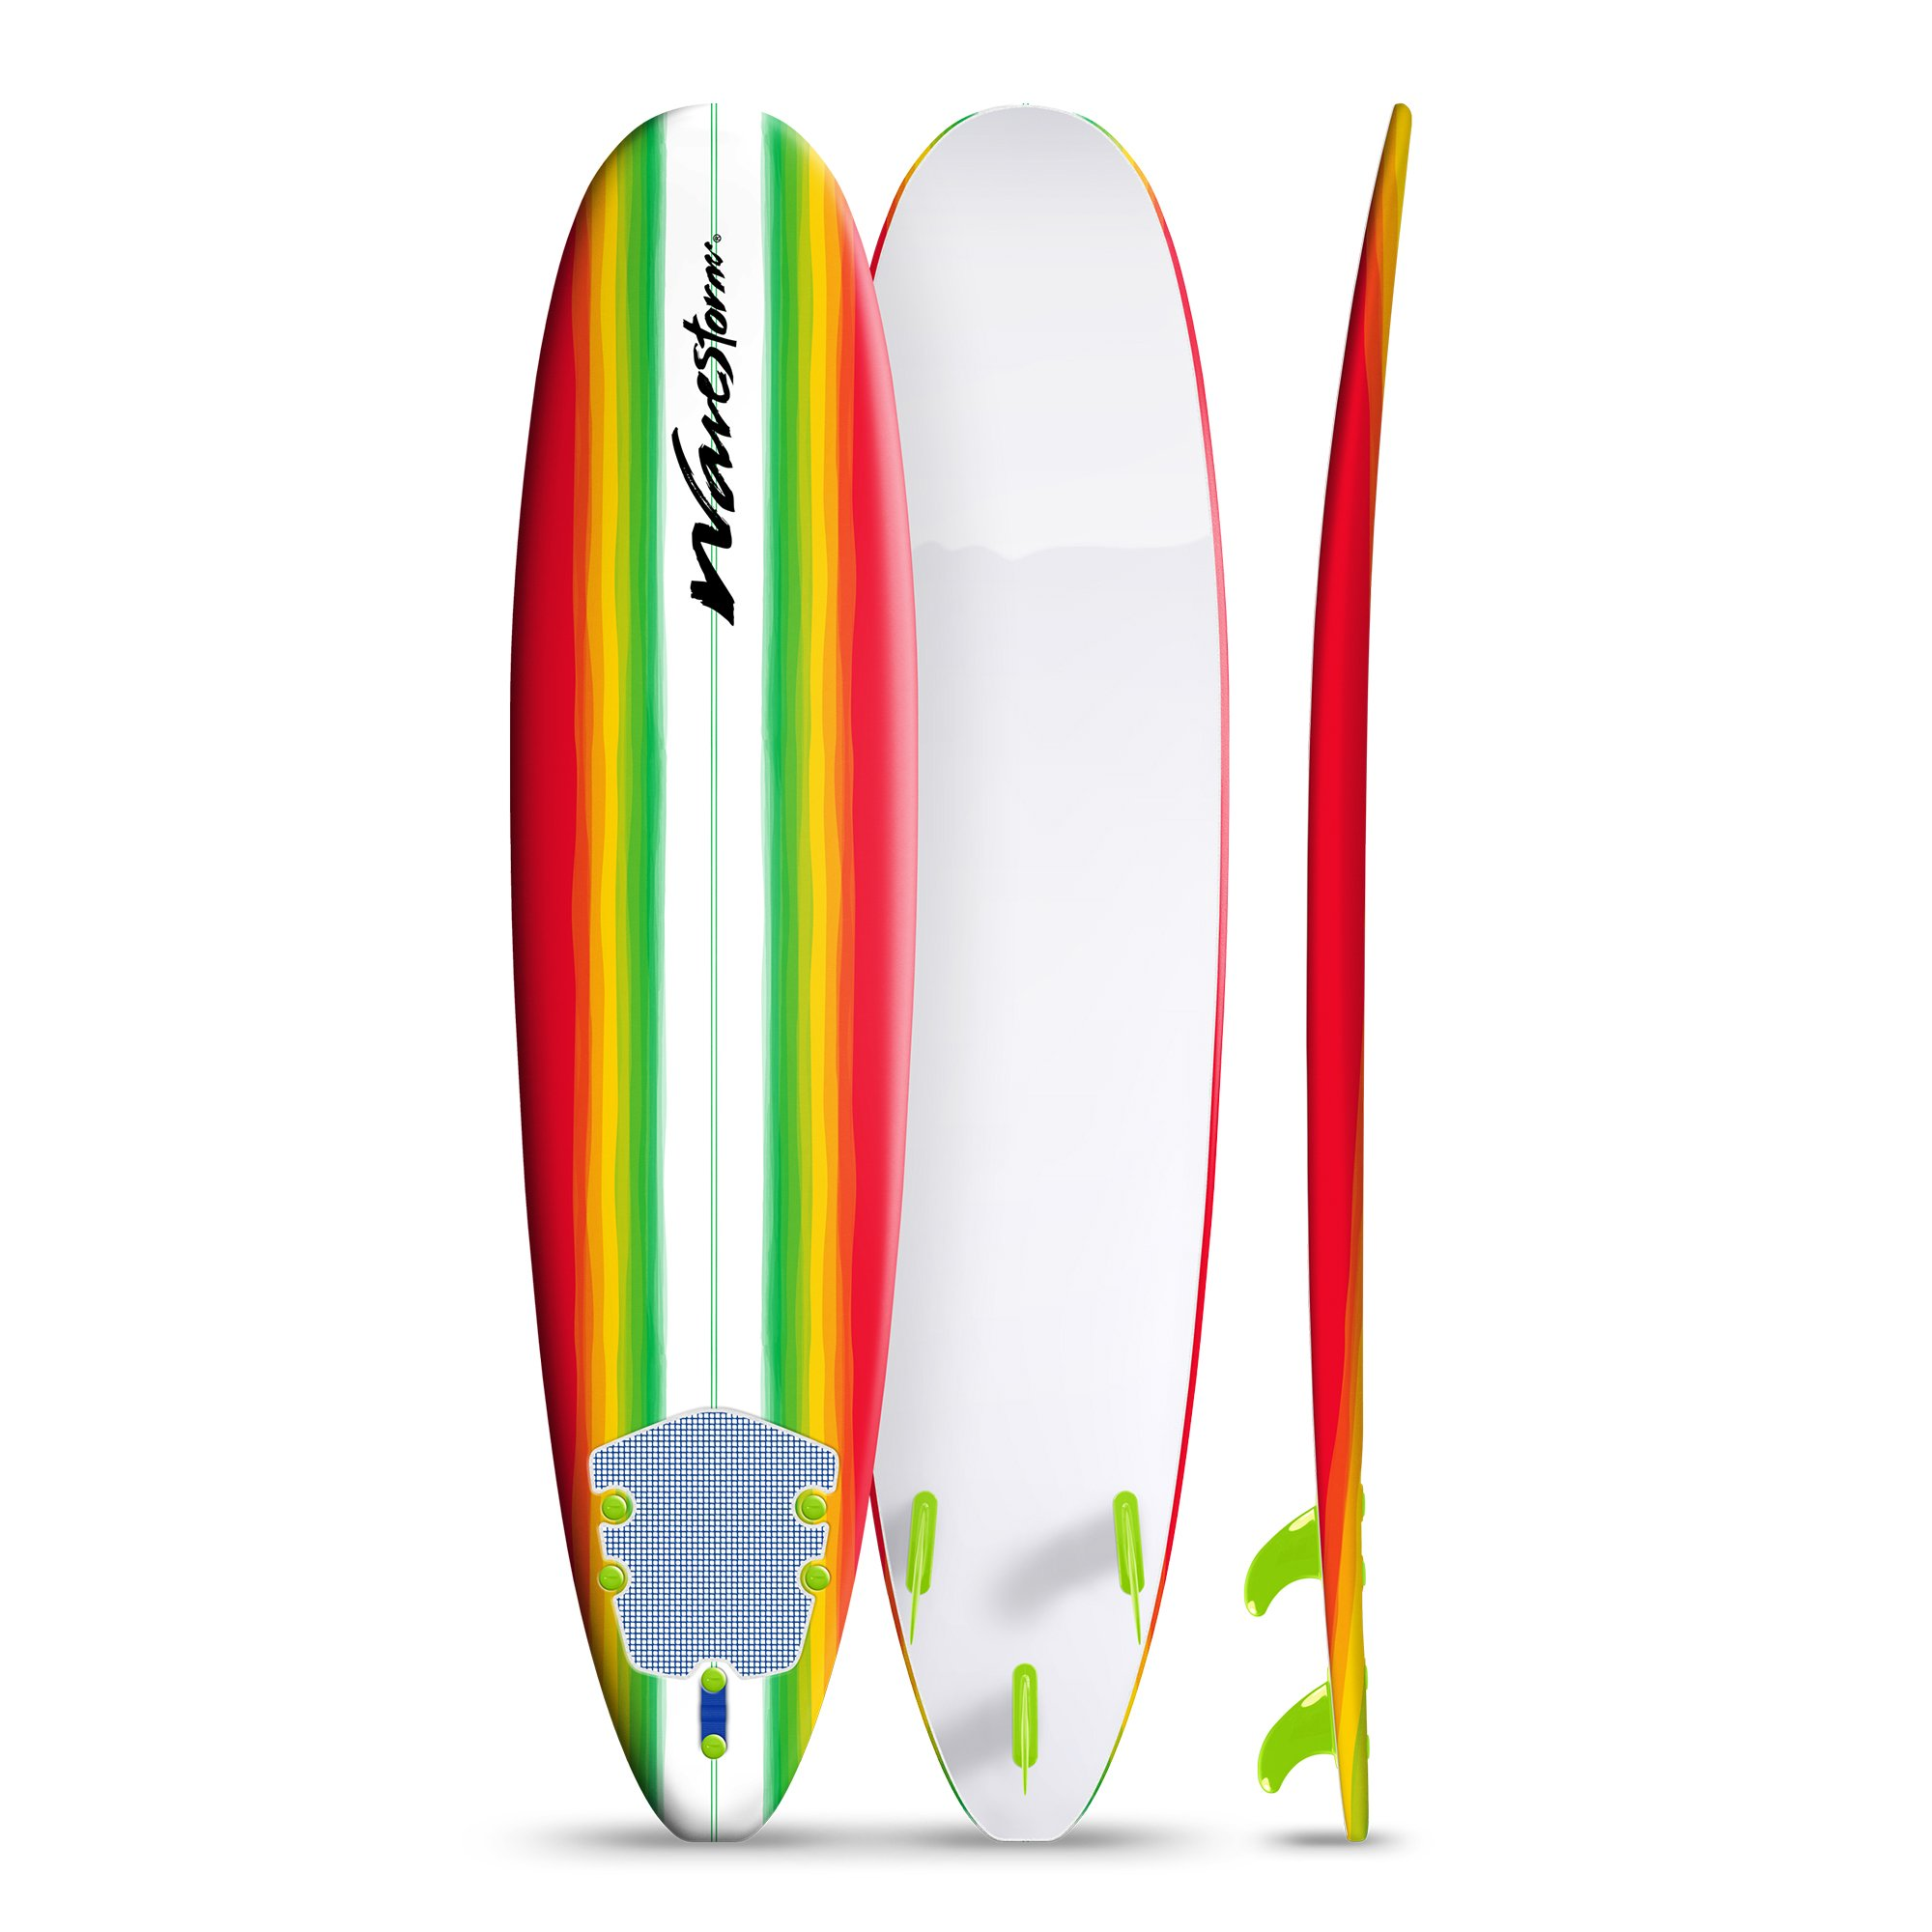 Wavestorm 8' Classic Surfboard by Wavestorm